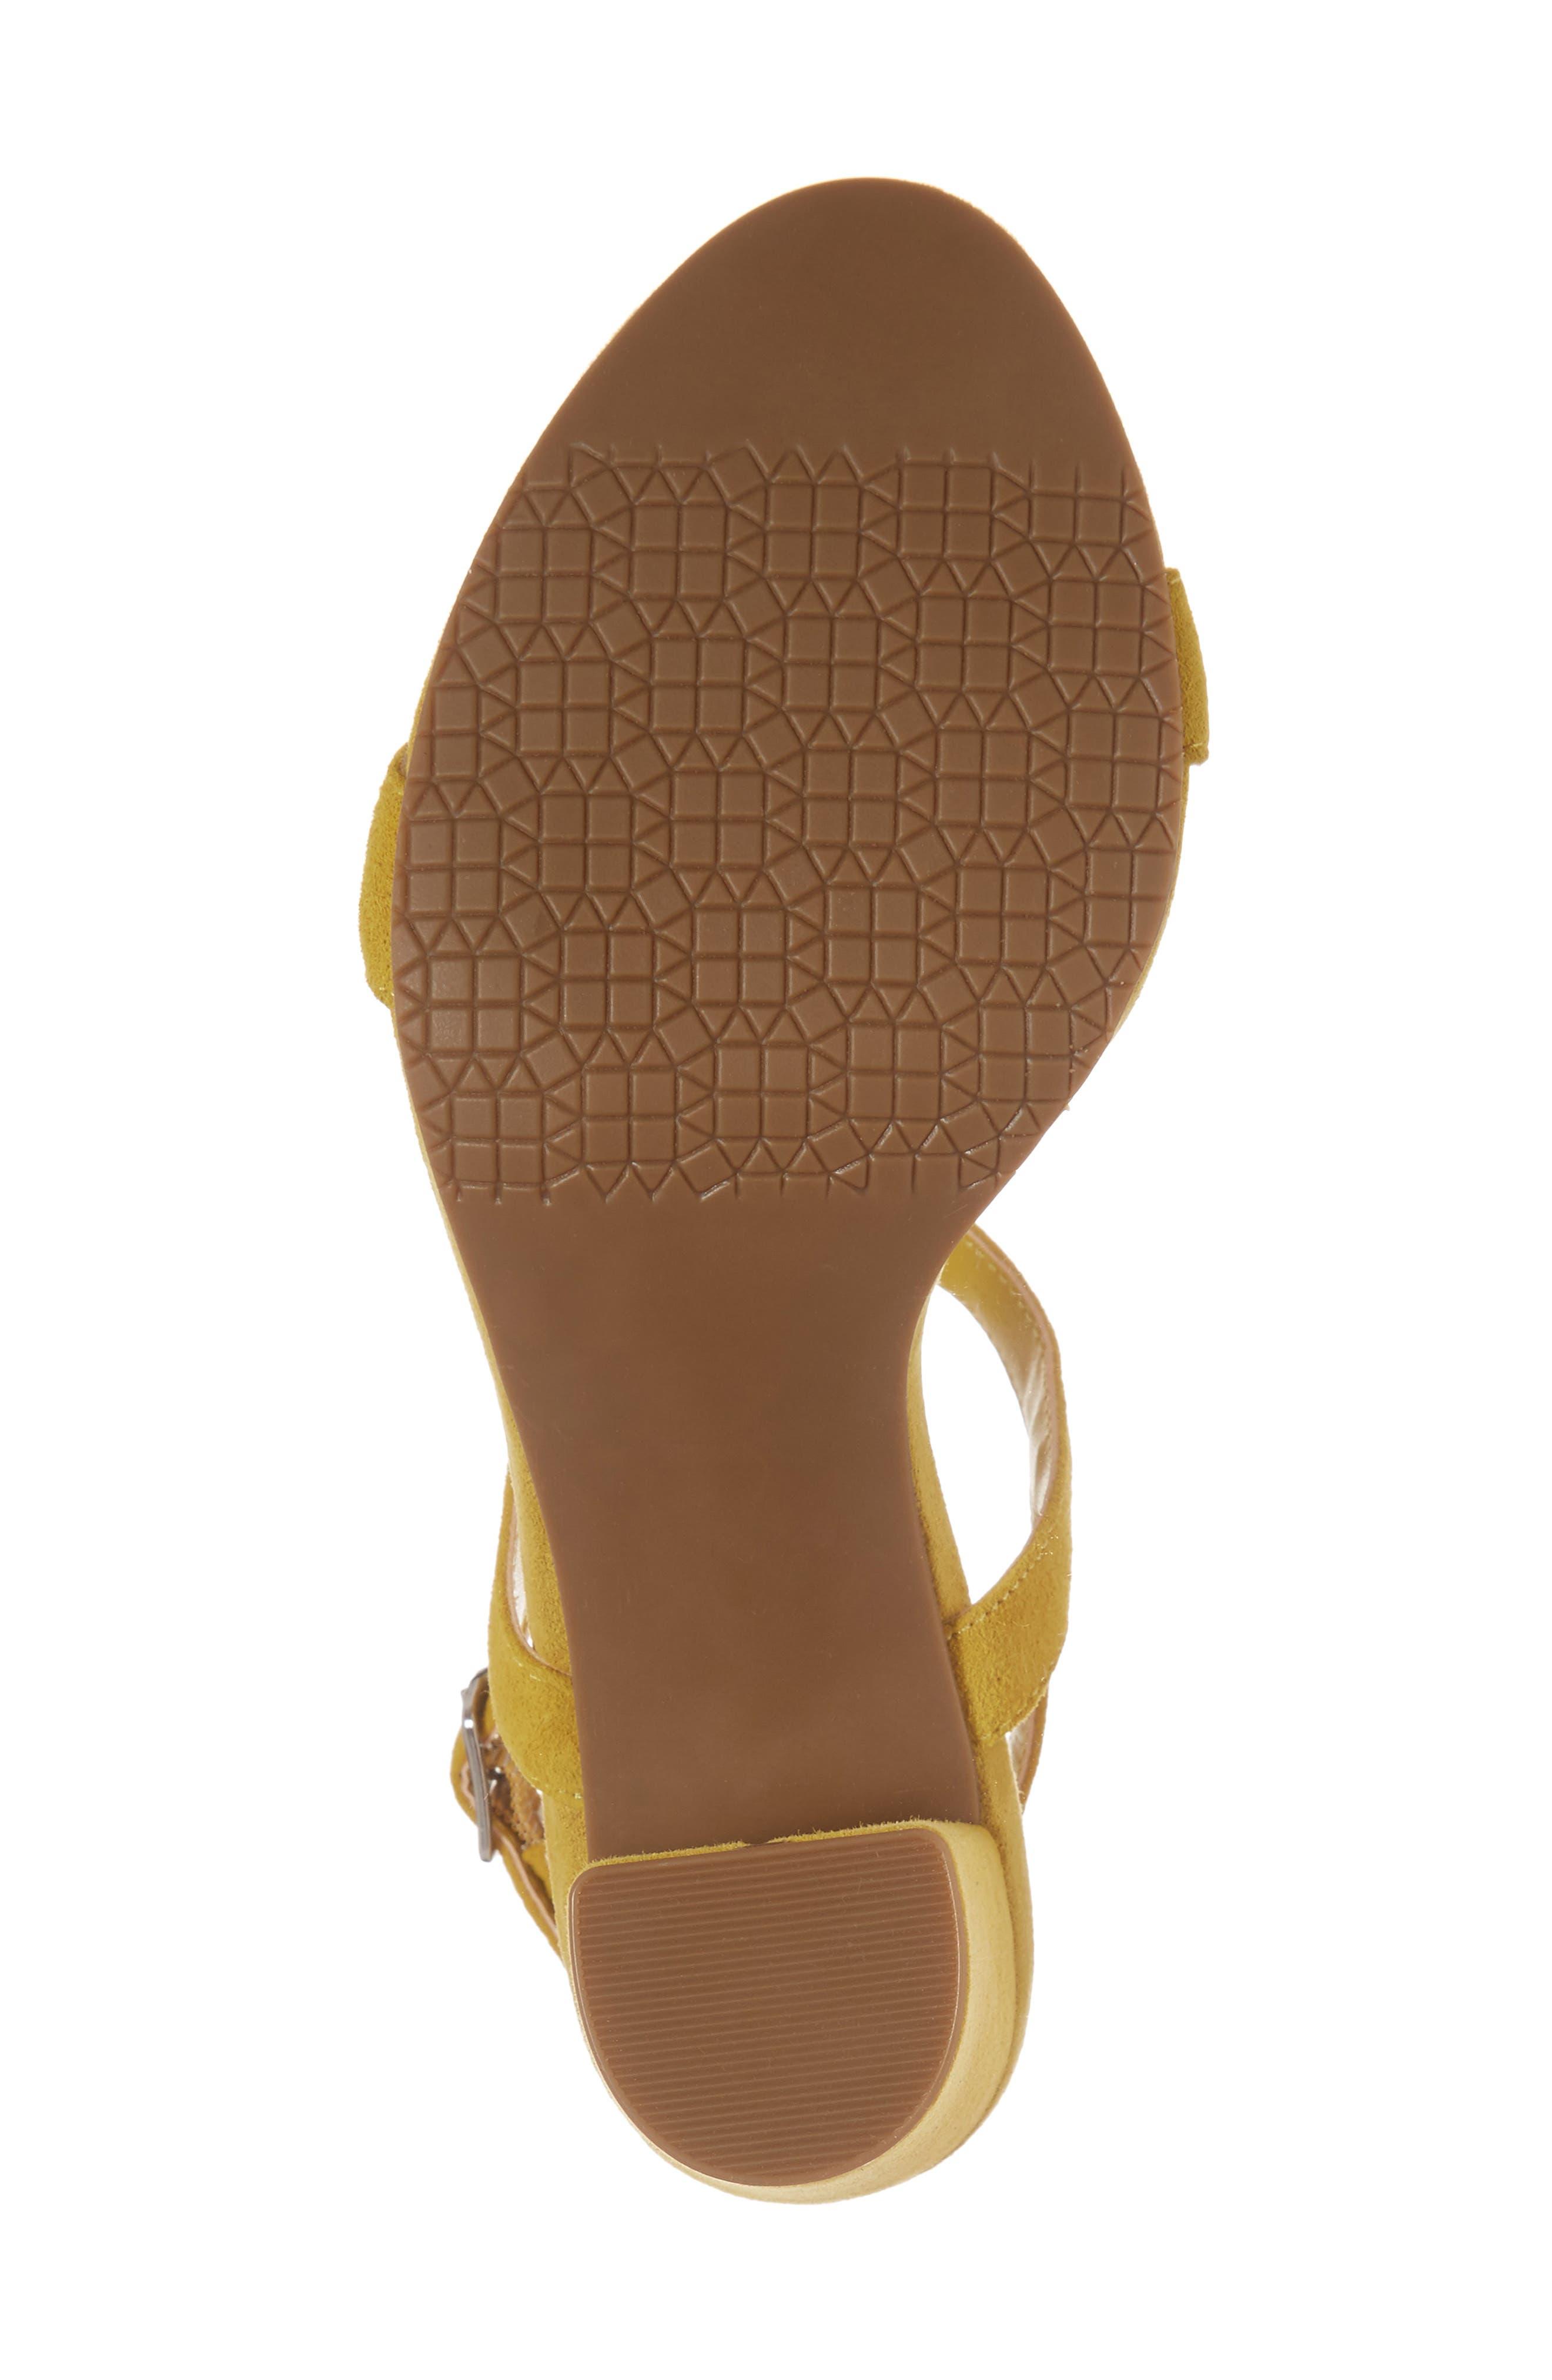 Lula Block Heel Slingback Sandal,                             Alternate thumbnail 6, color,                             Yellow Suede